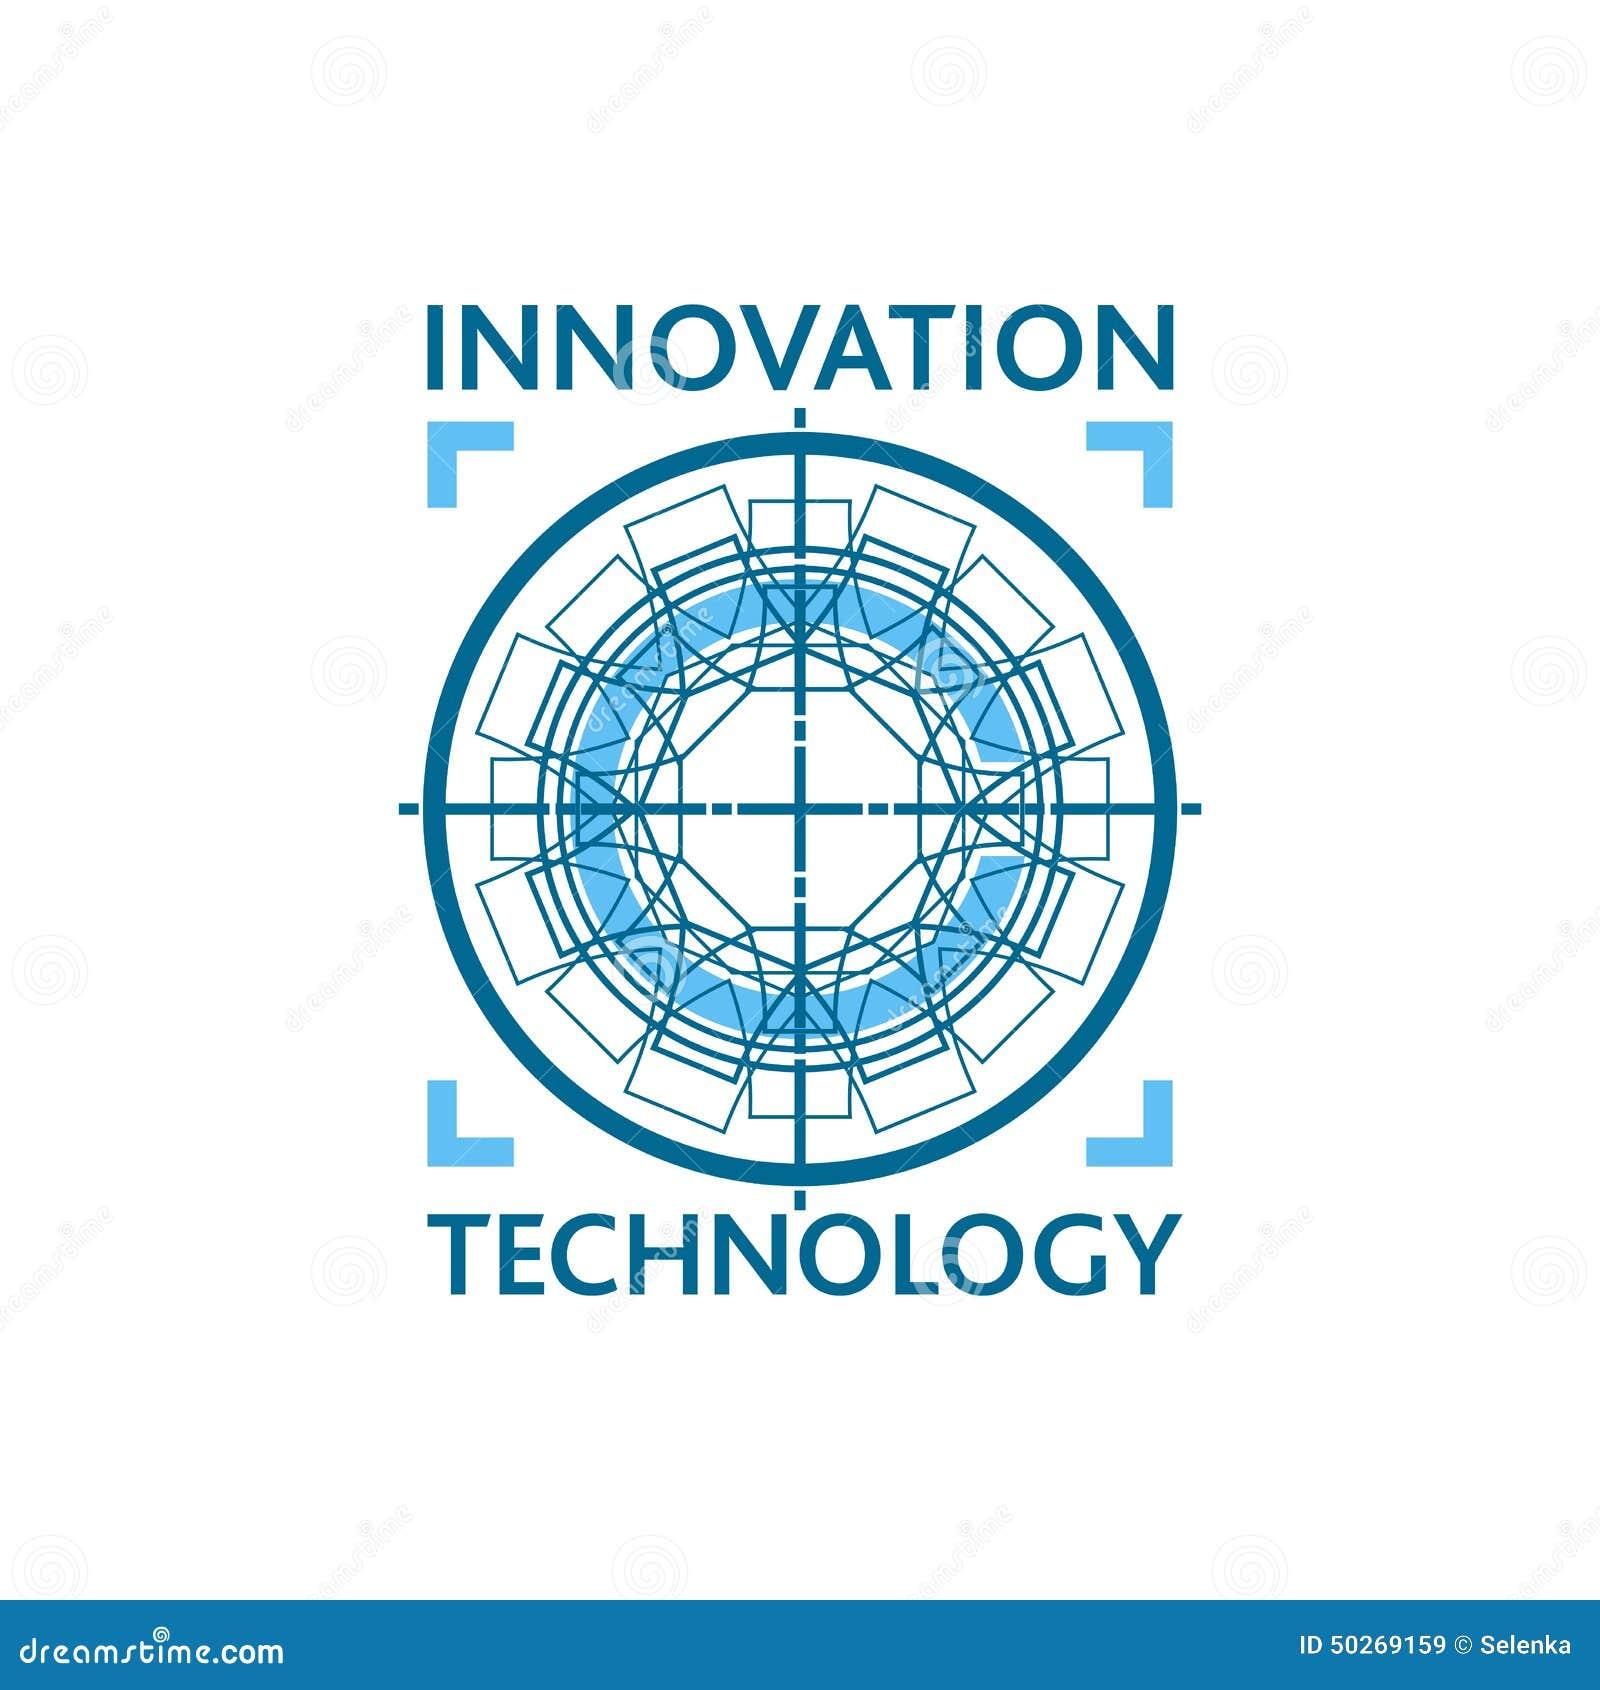 Alberta innovates technology futures business plan